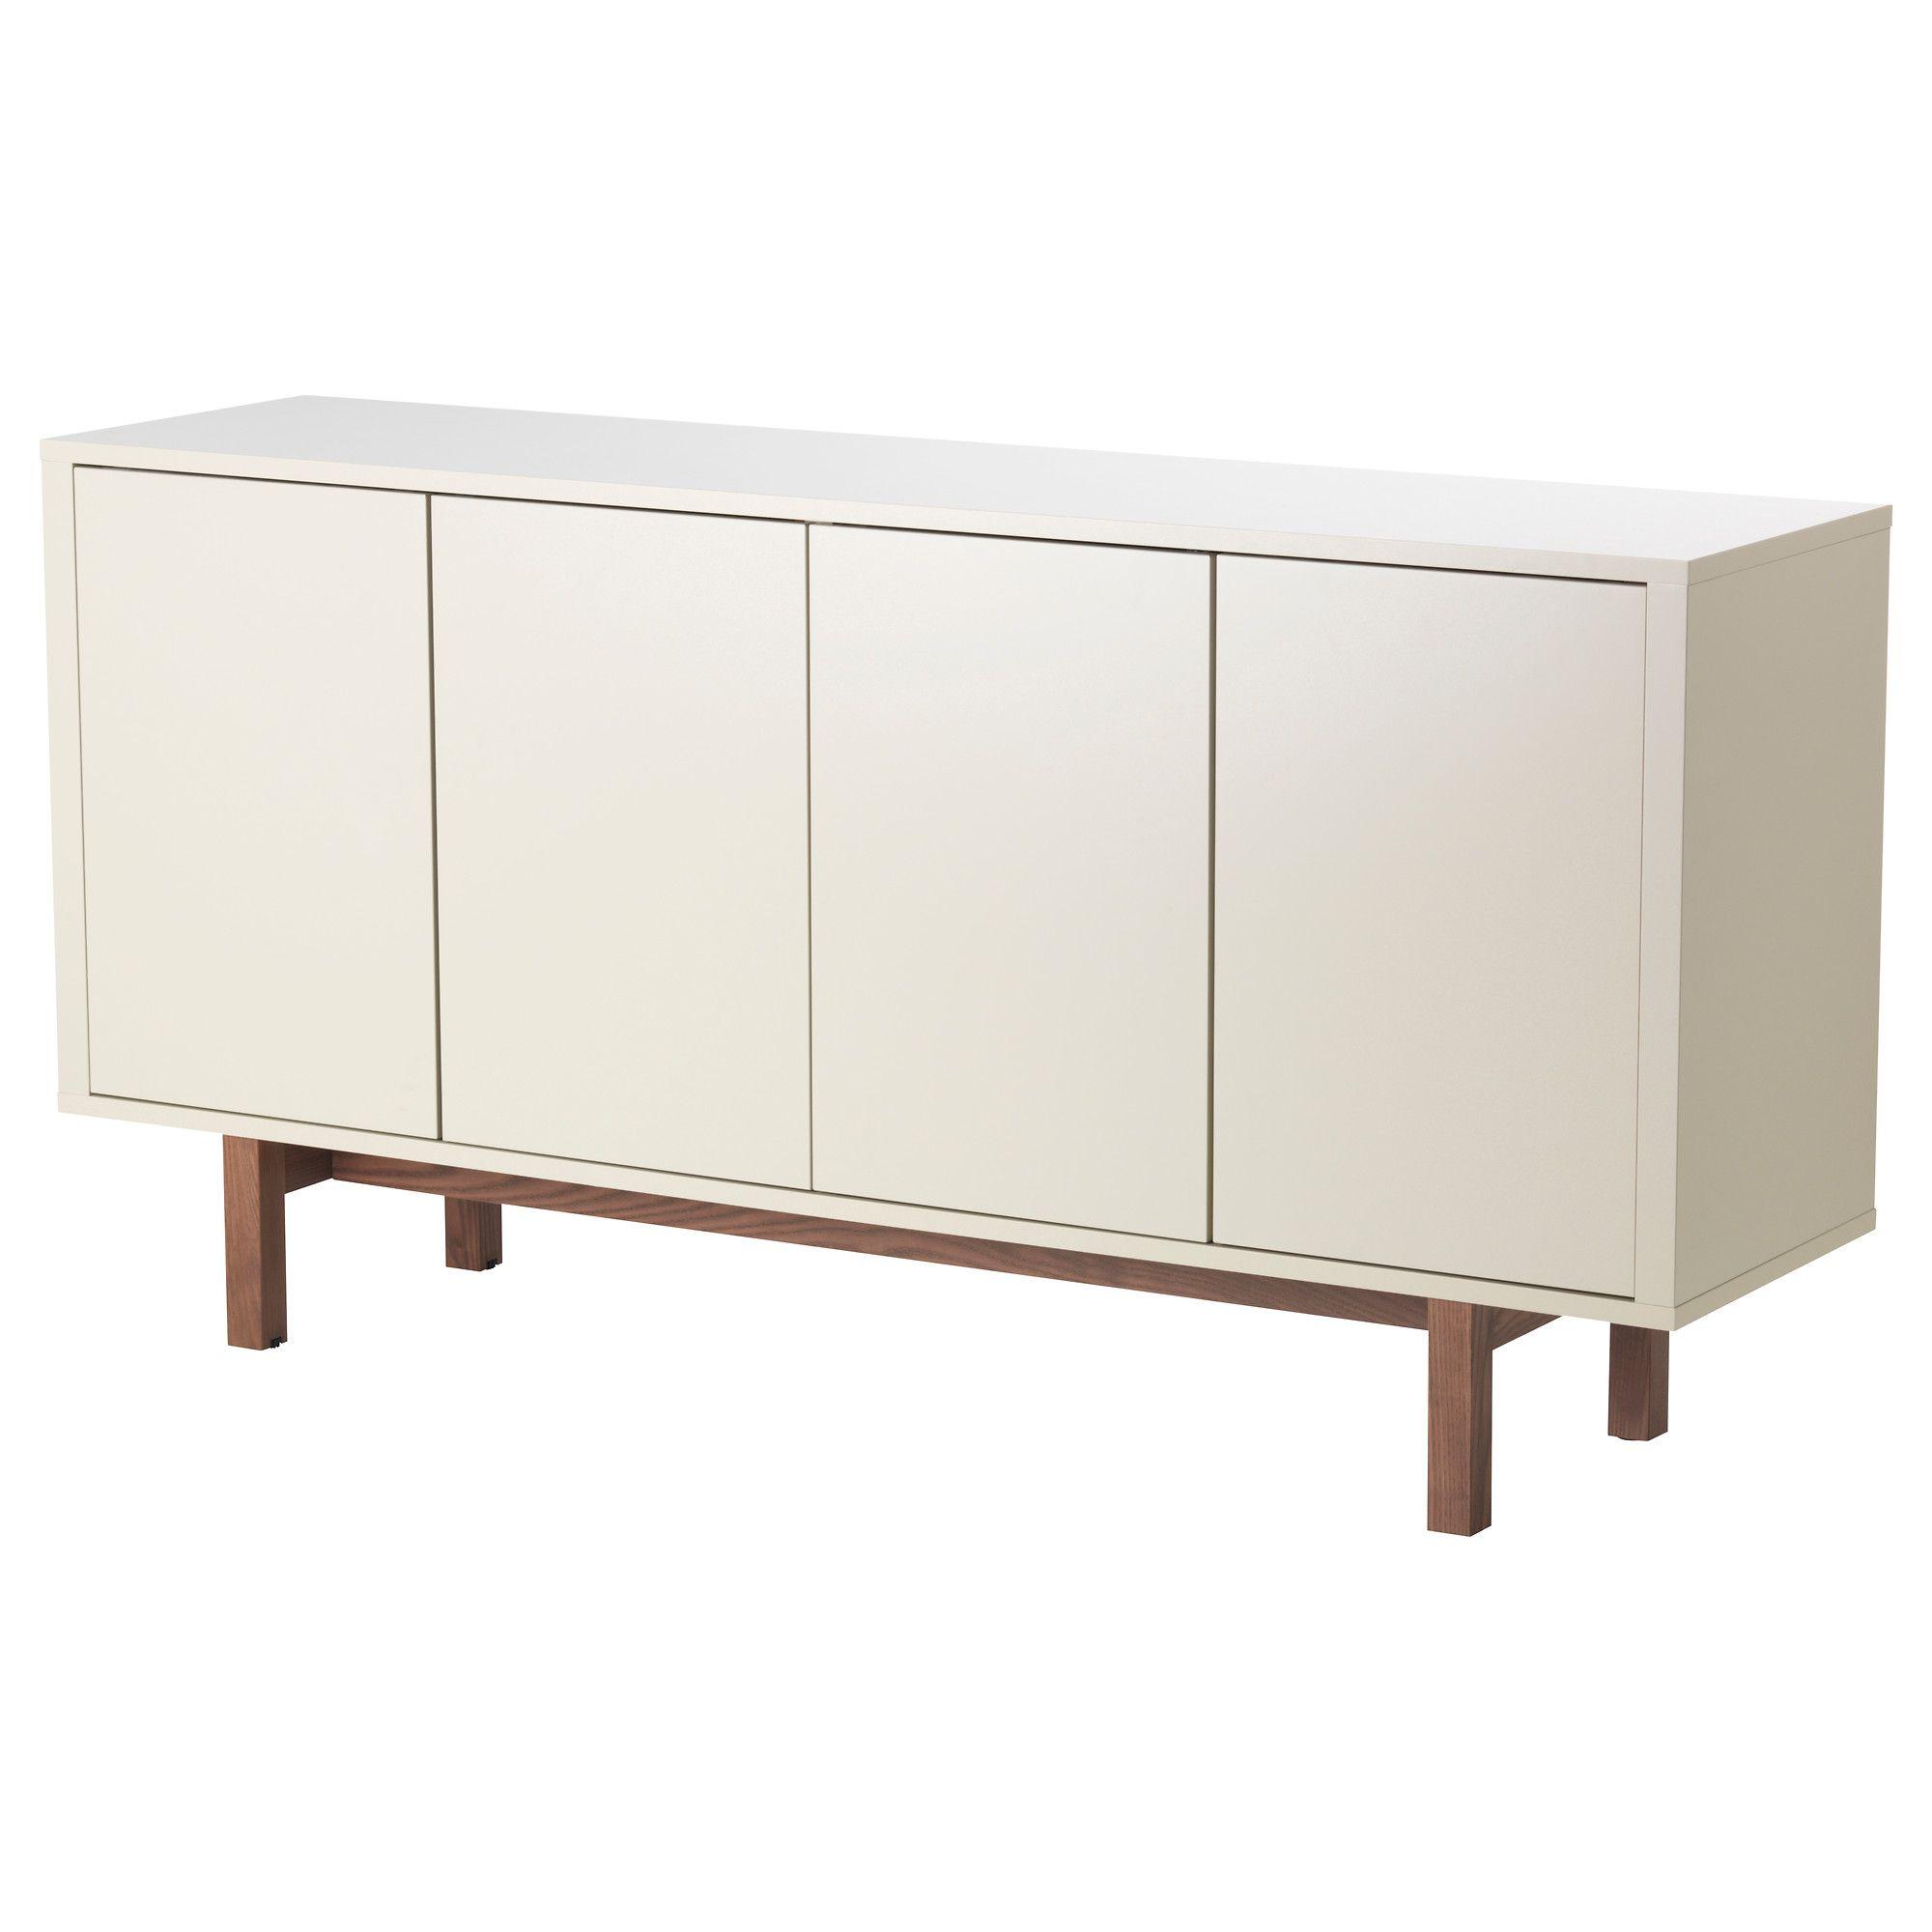 Full Size of Fresh Home Furnishing Ideas And Affordable Furniture Ikea Sideboard Küche Kosten Sofa Mit Schlaffunktion Kaufen Betten 160x200 Miniküche Wohnzimmer Bei Wohnzimmer Ikea Sideboard